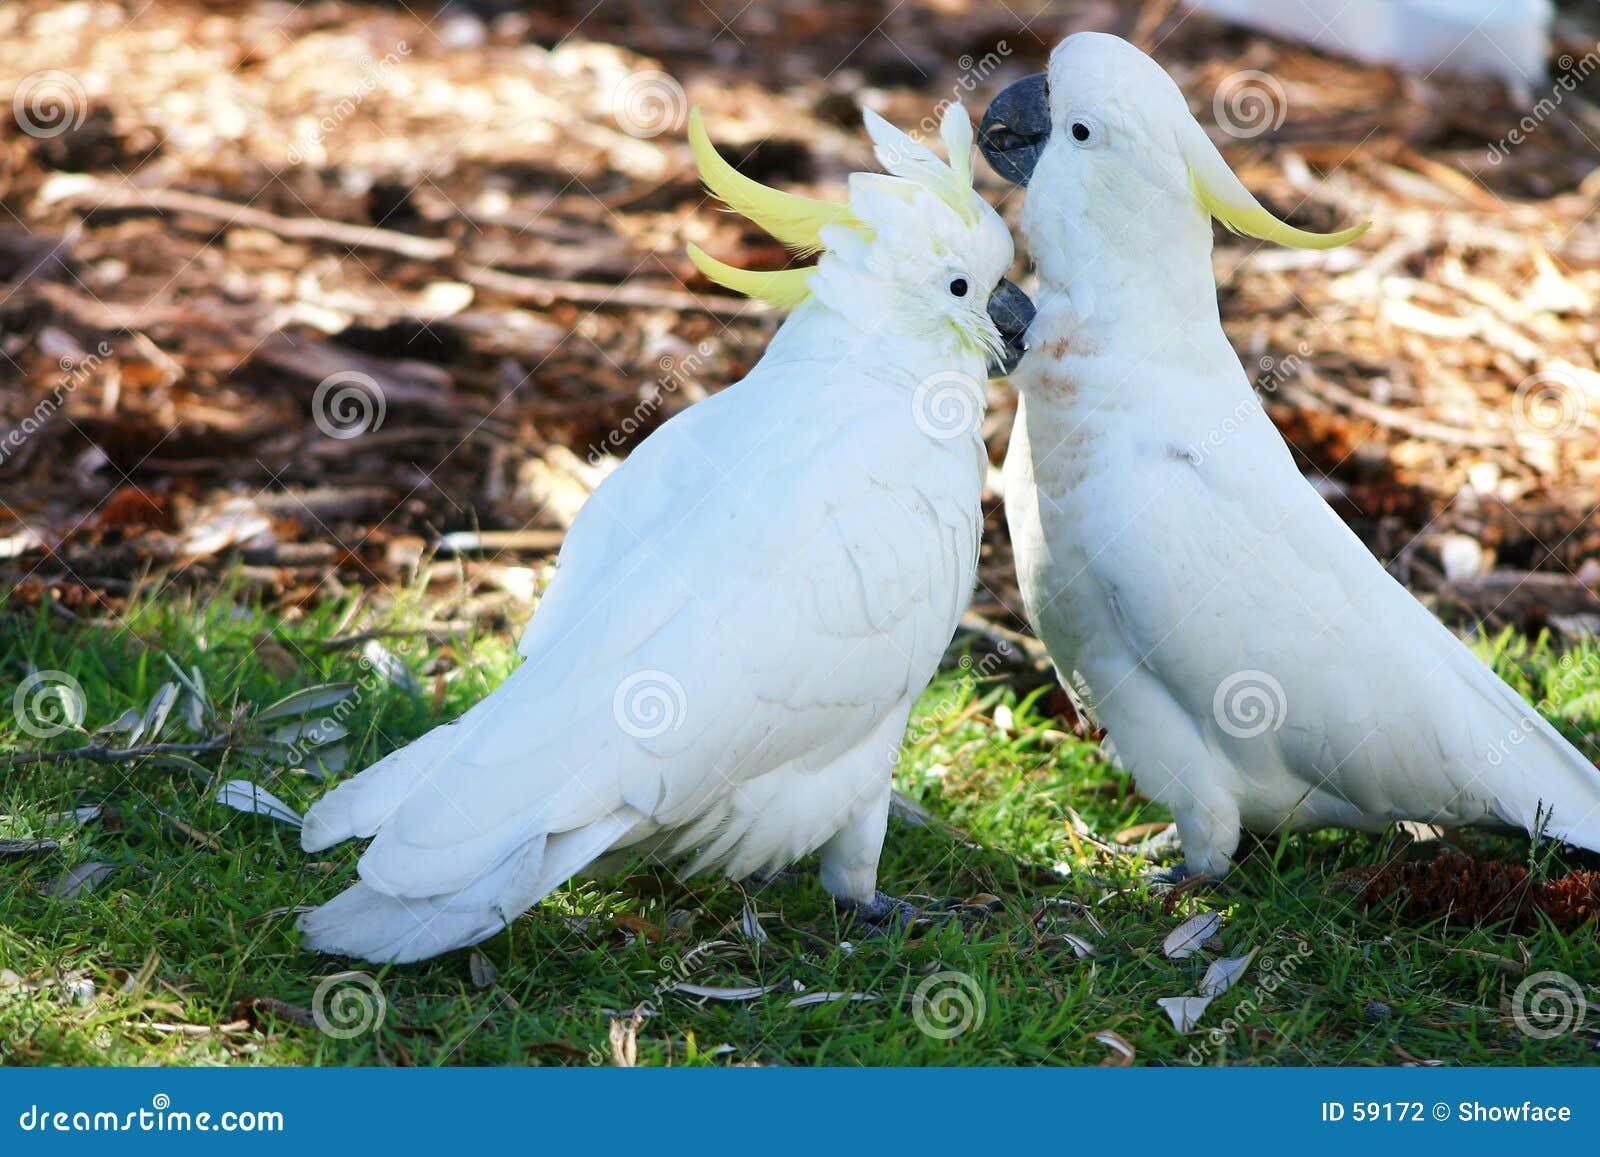 Cockatoos Canoodling